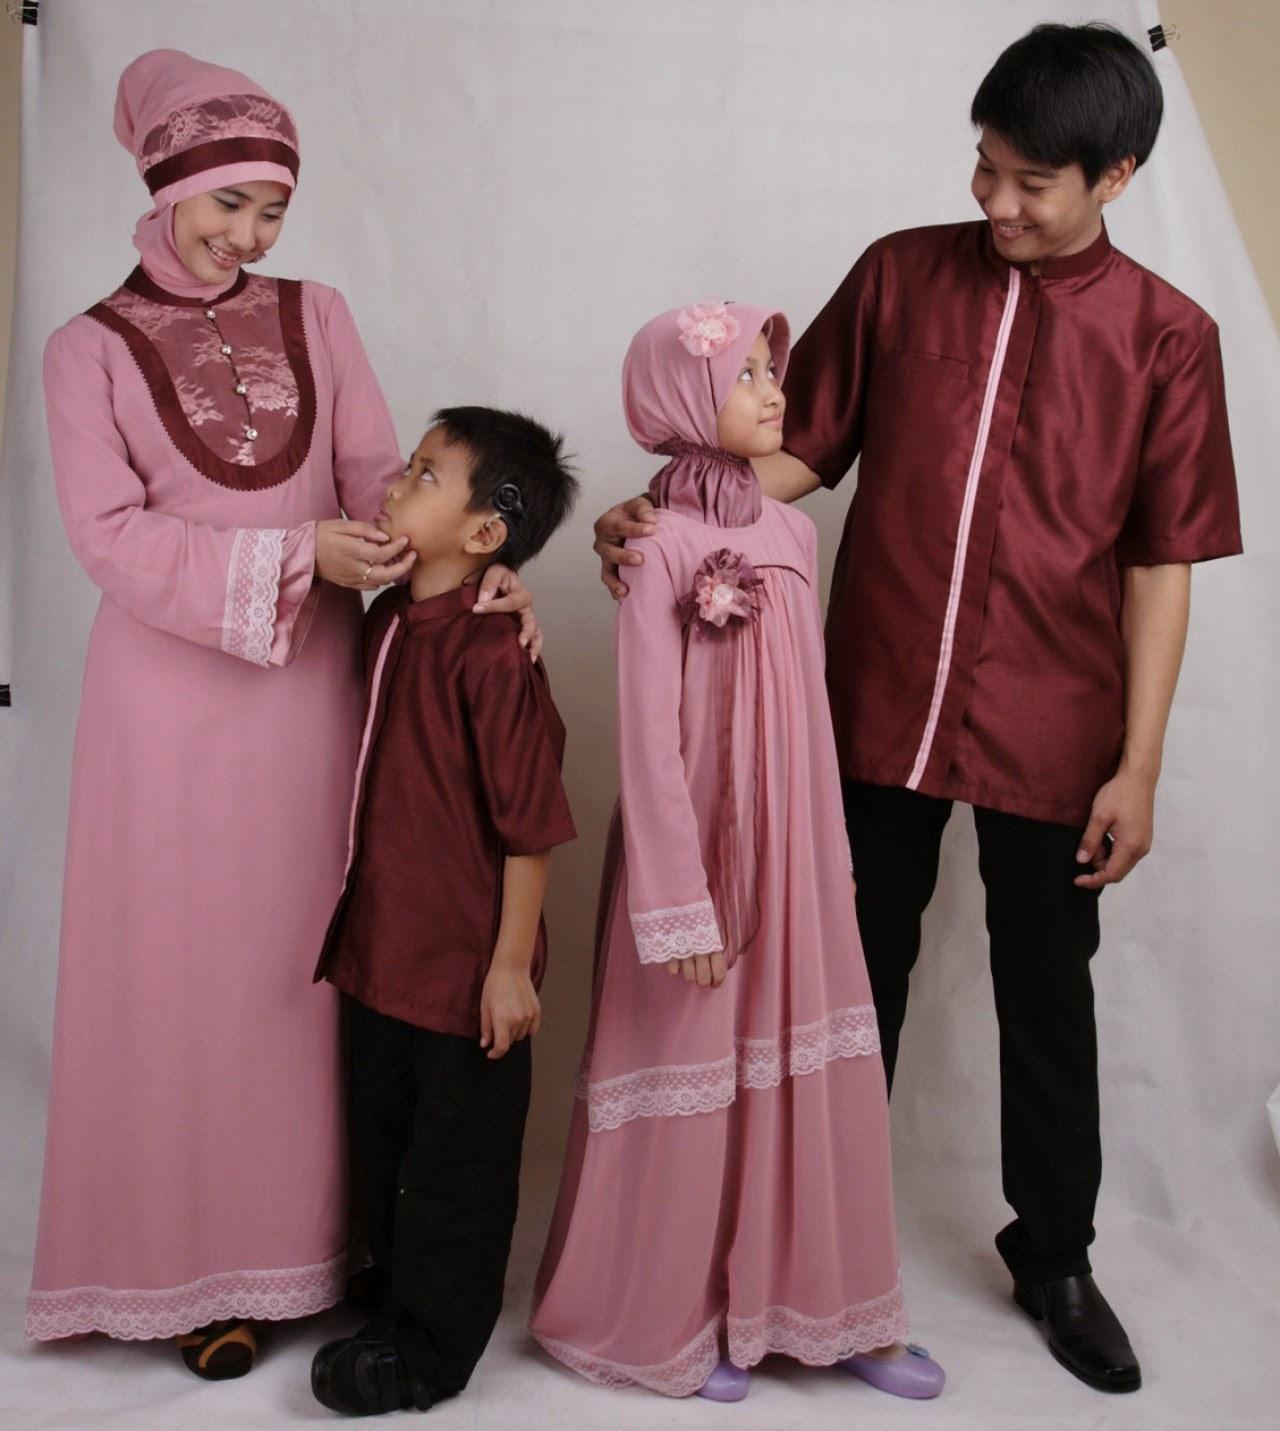 Ide Baju Lebaran Buat Keluarga Fmdf Model Baju Keluarga Muslim Seragam Kembar Terbaru 2018